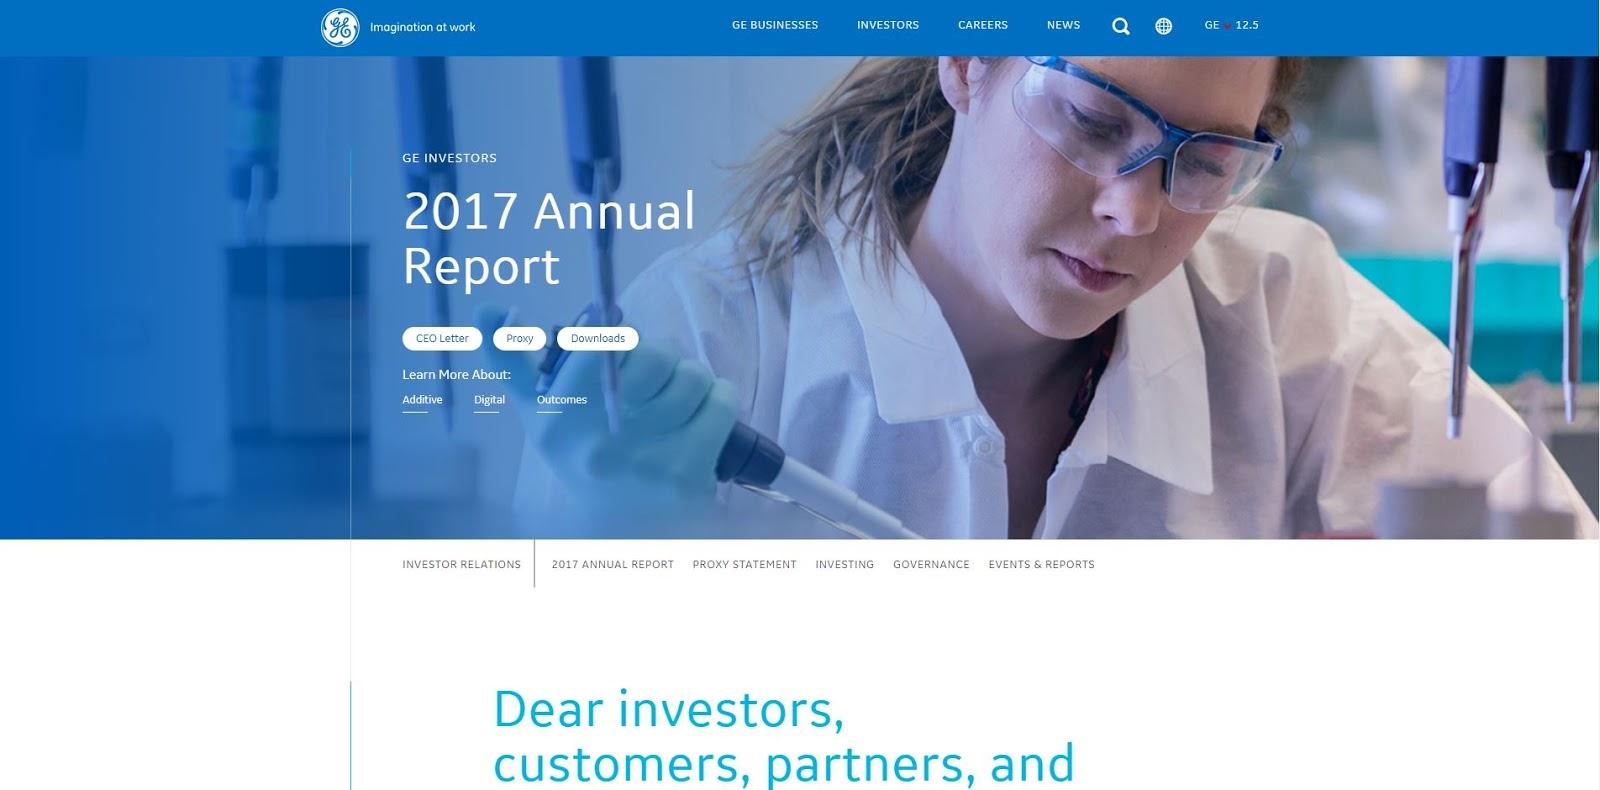 GE annual report